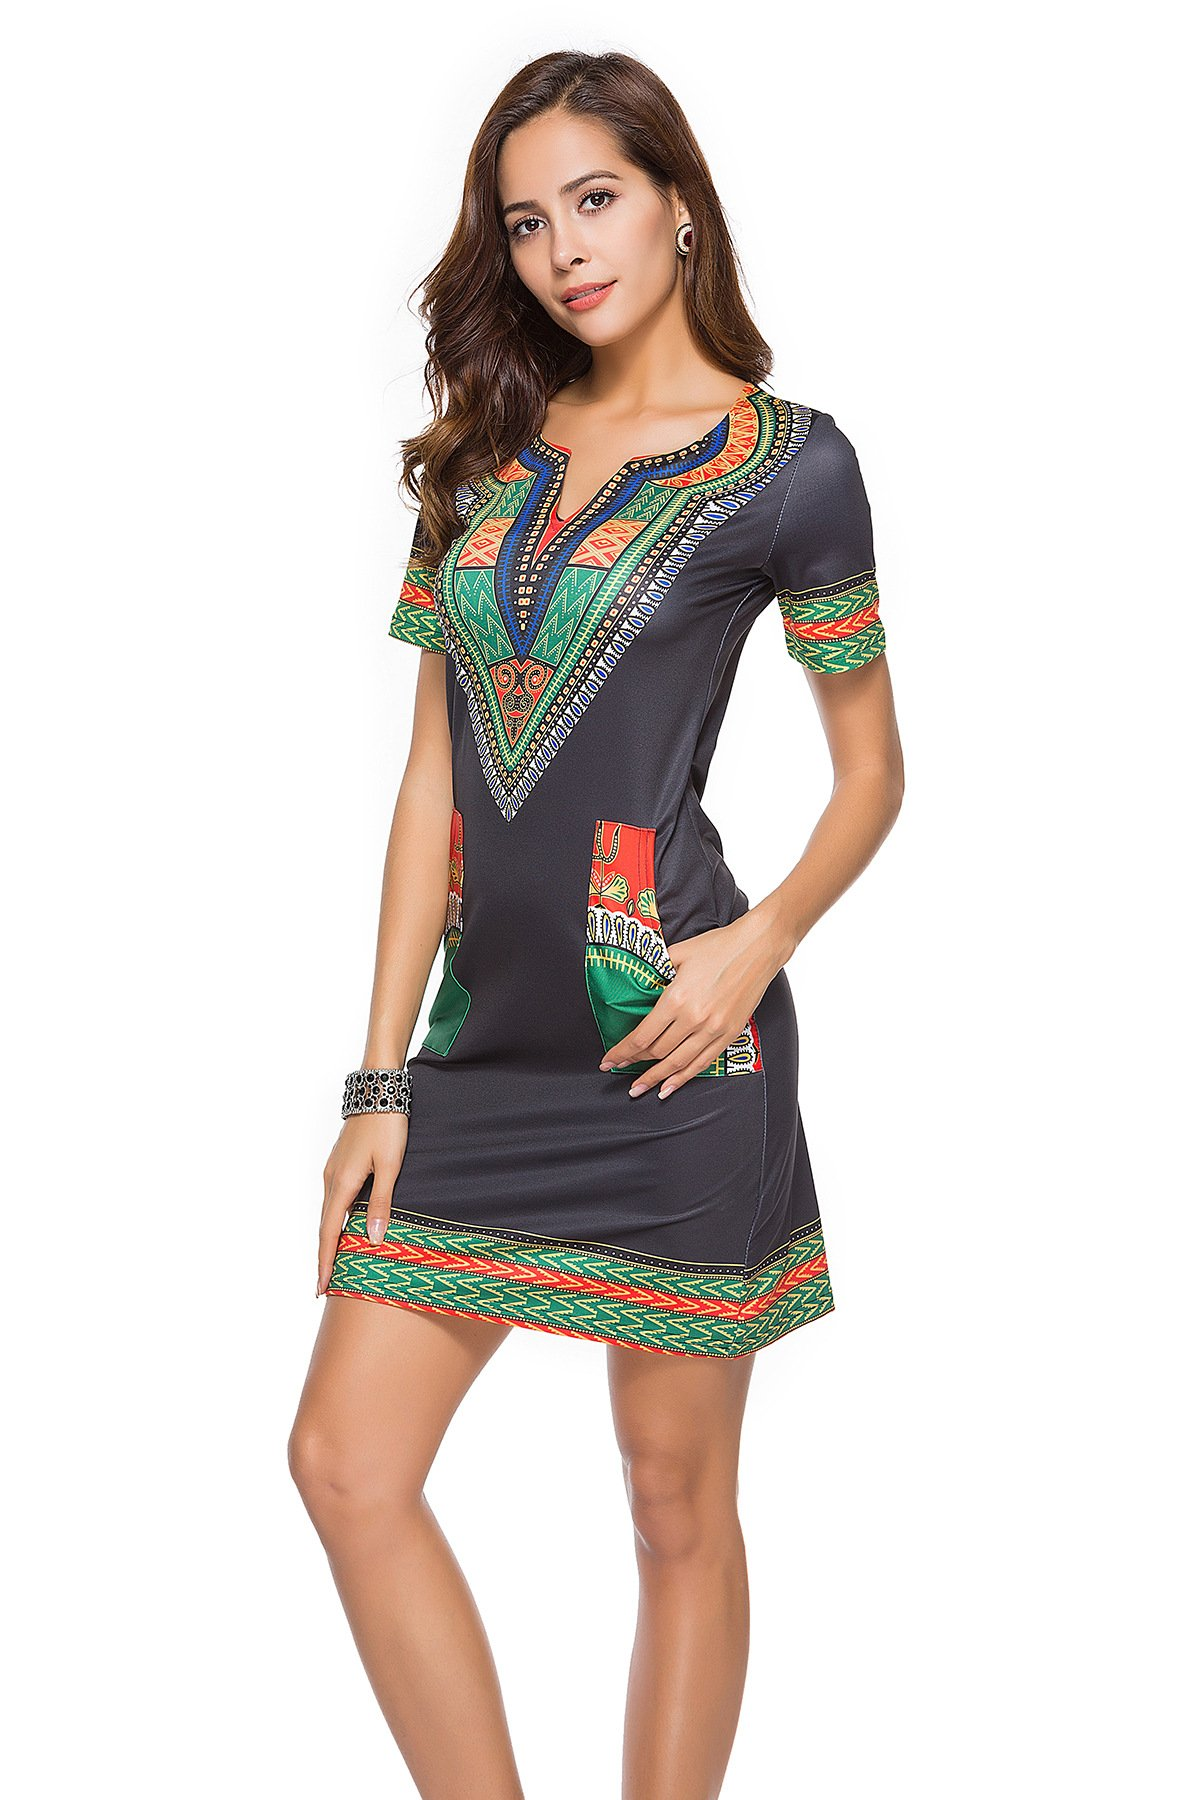 TOSHOW Fashion Dress, V-Neck Print Skirt, Summer Dress (Short Sleeve, 2 Colors, 5 Sizes) (Black Bottom Green, M)